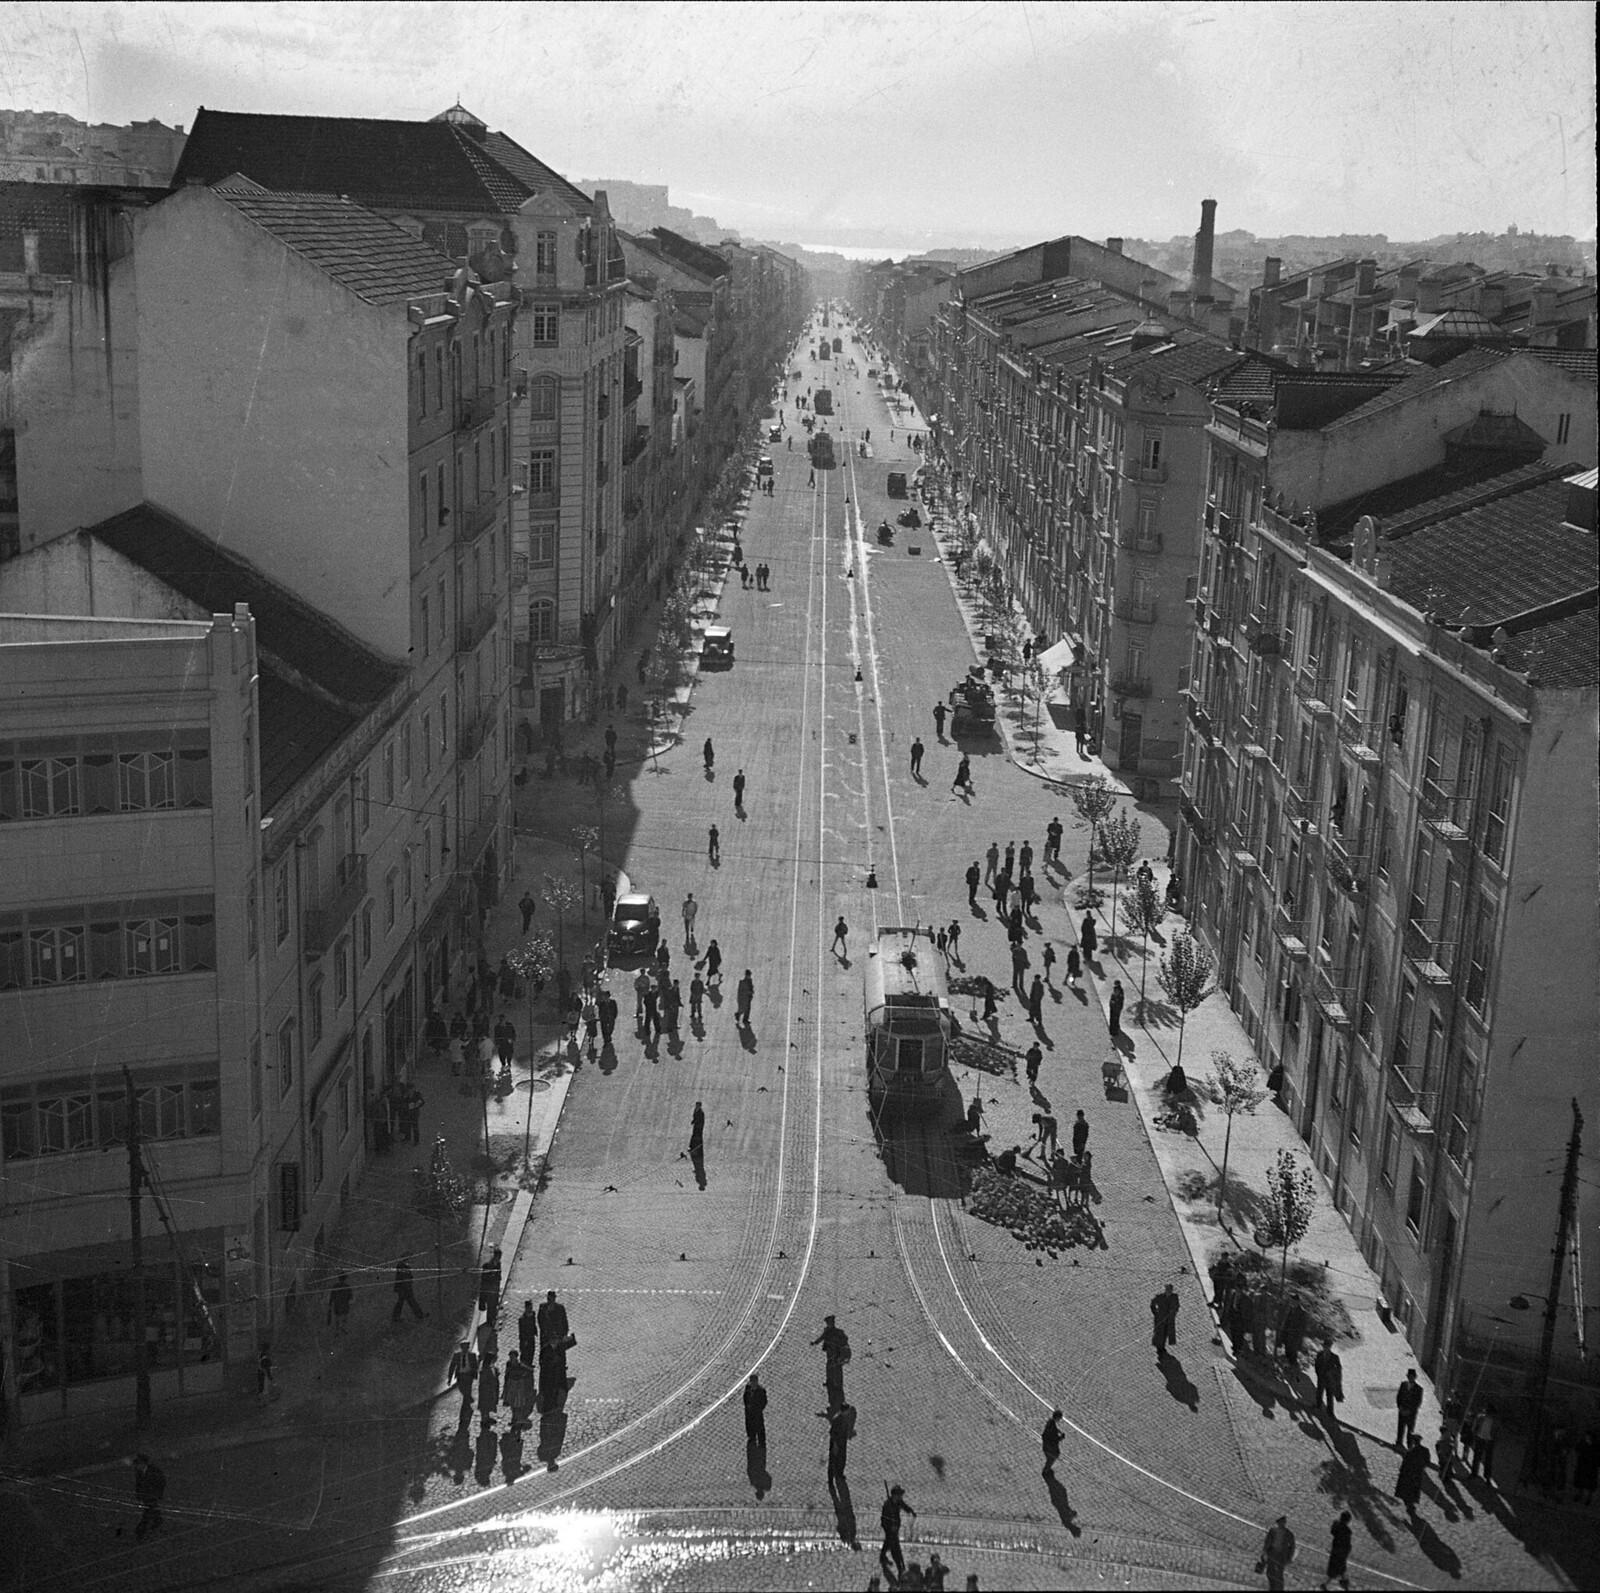 Av. Almirante Reis, Lisboa (M. Novais, 1939)